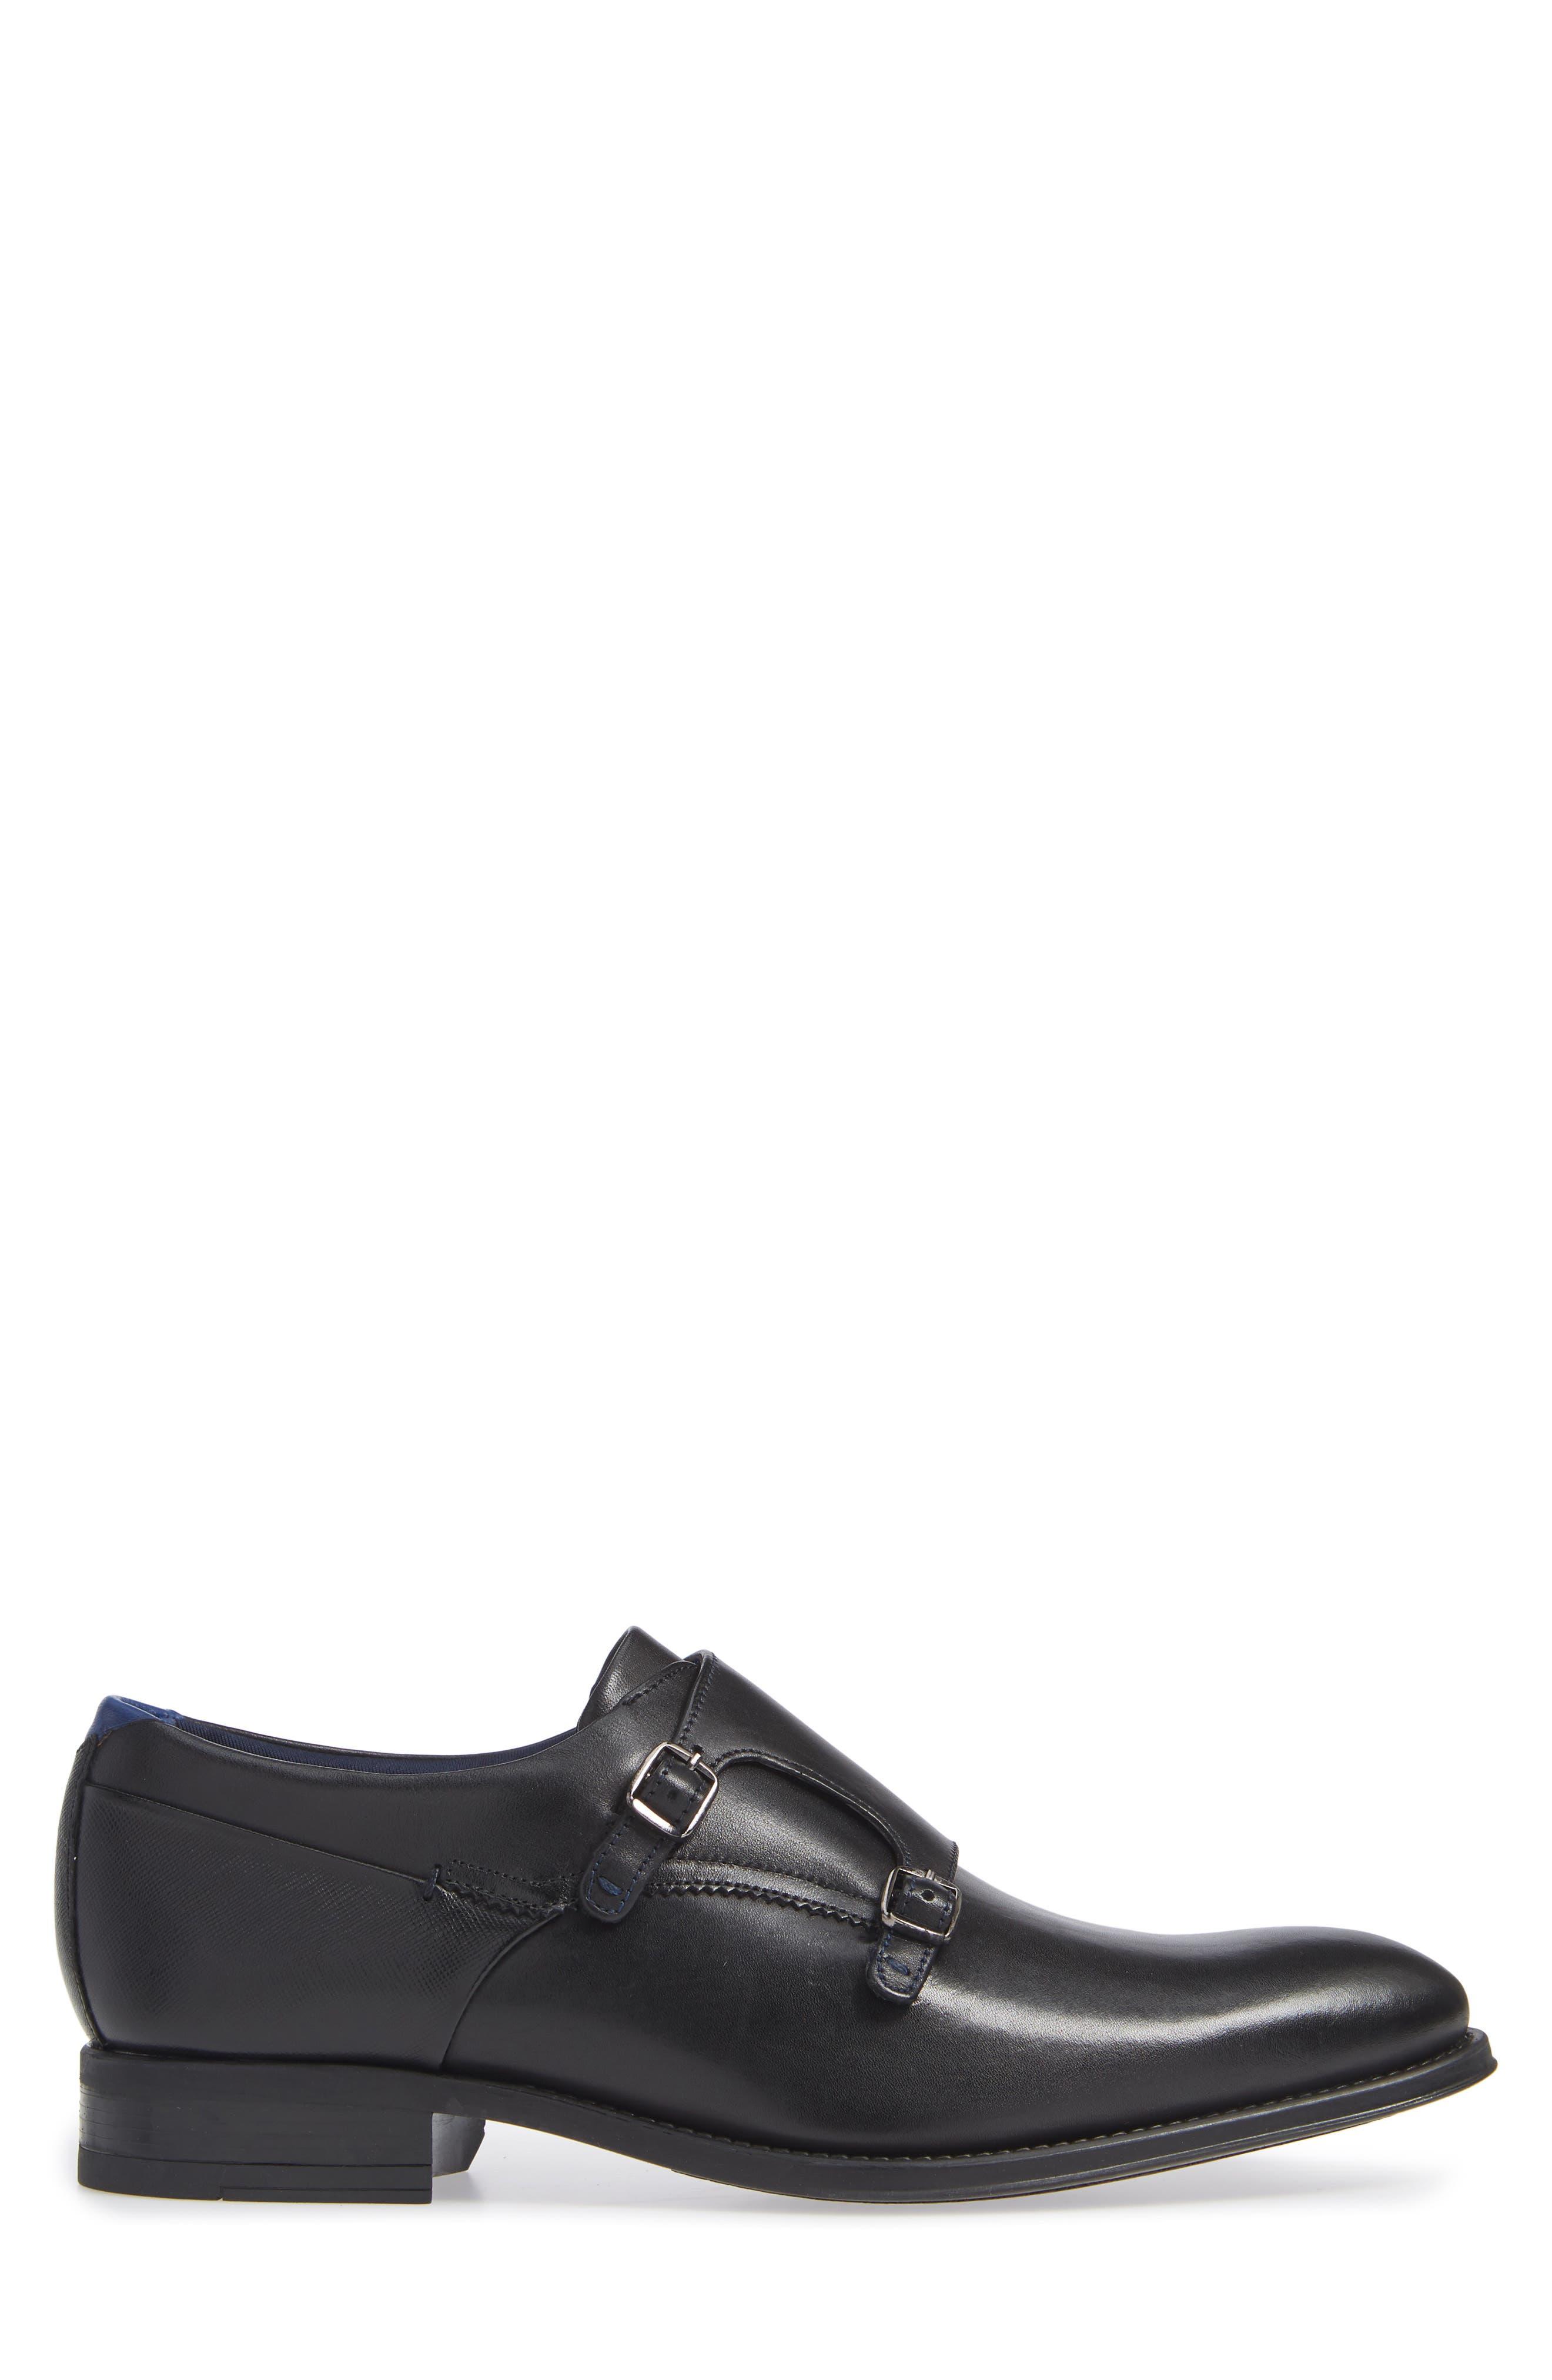 TED BAKER LONDON, Cathon Double Buckle Monk Shoe, Alternate thumbnail 3, color, BLACK LEATHER